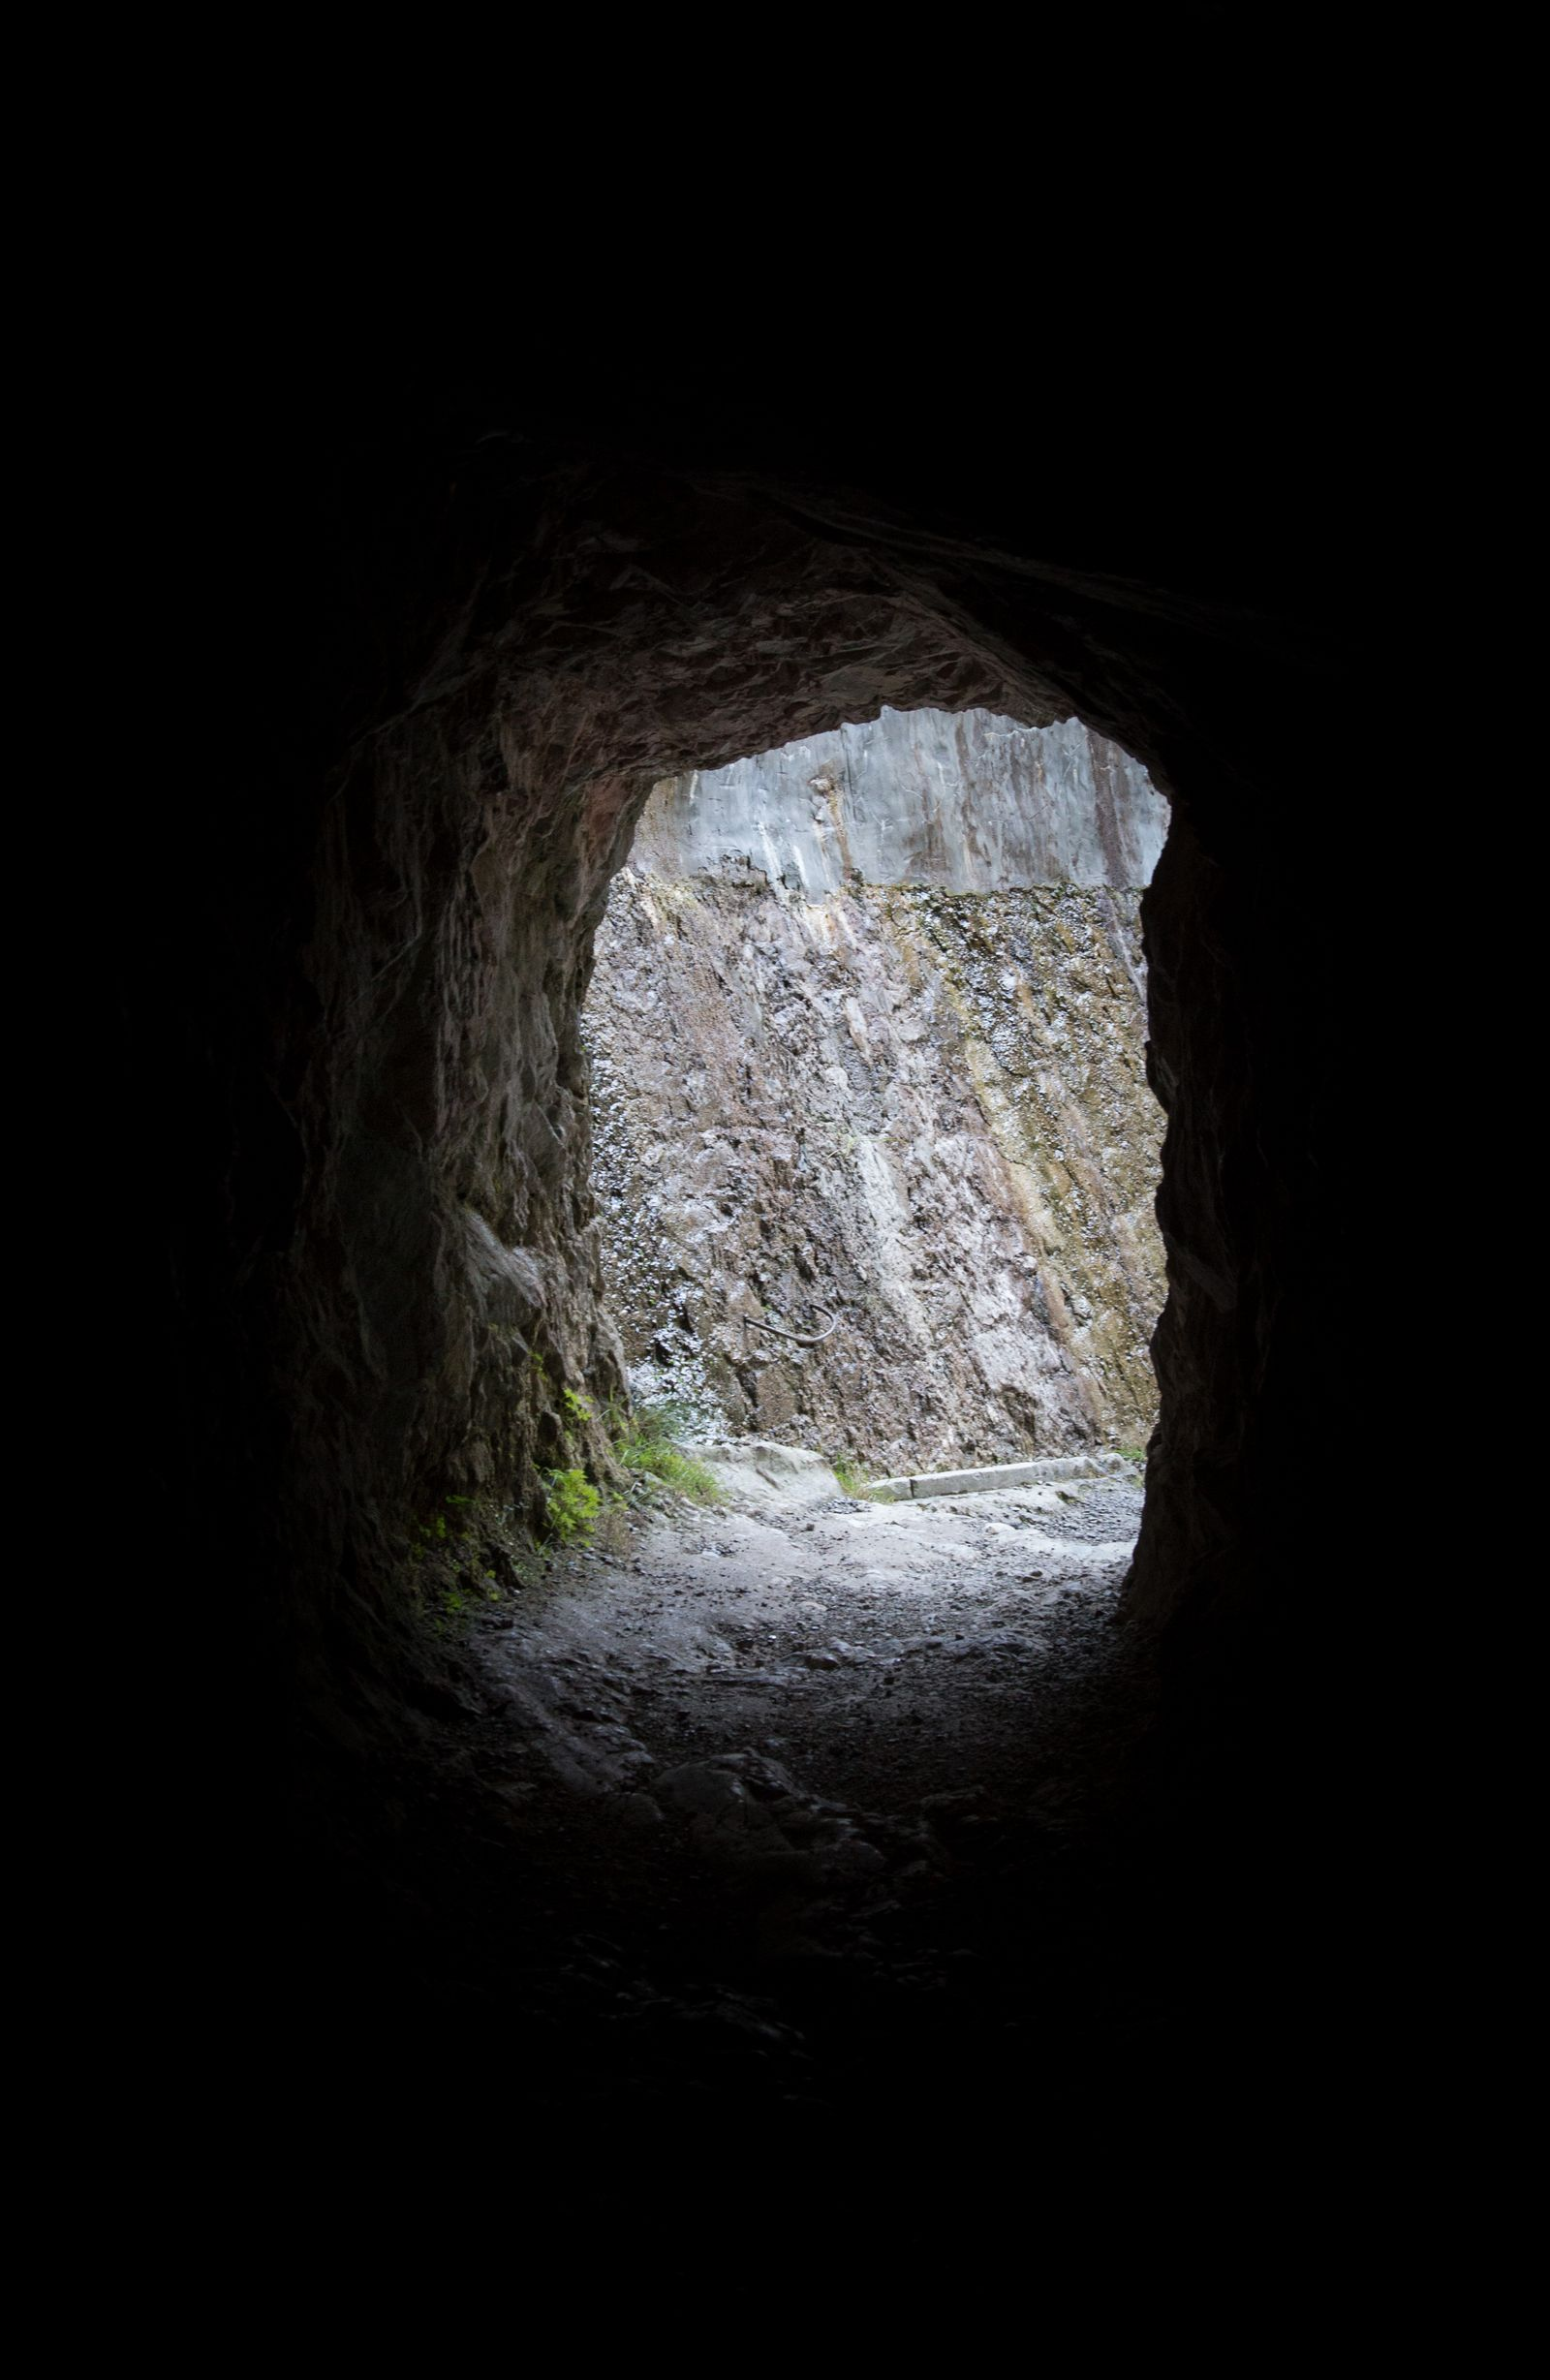 Tenemos que atravesar oscuros túneles